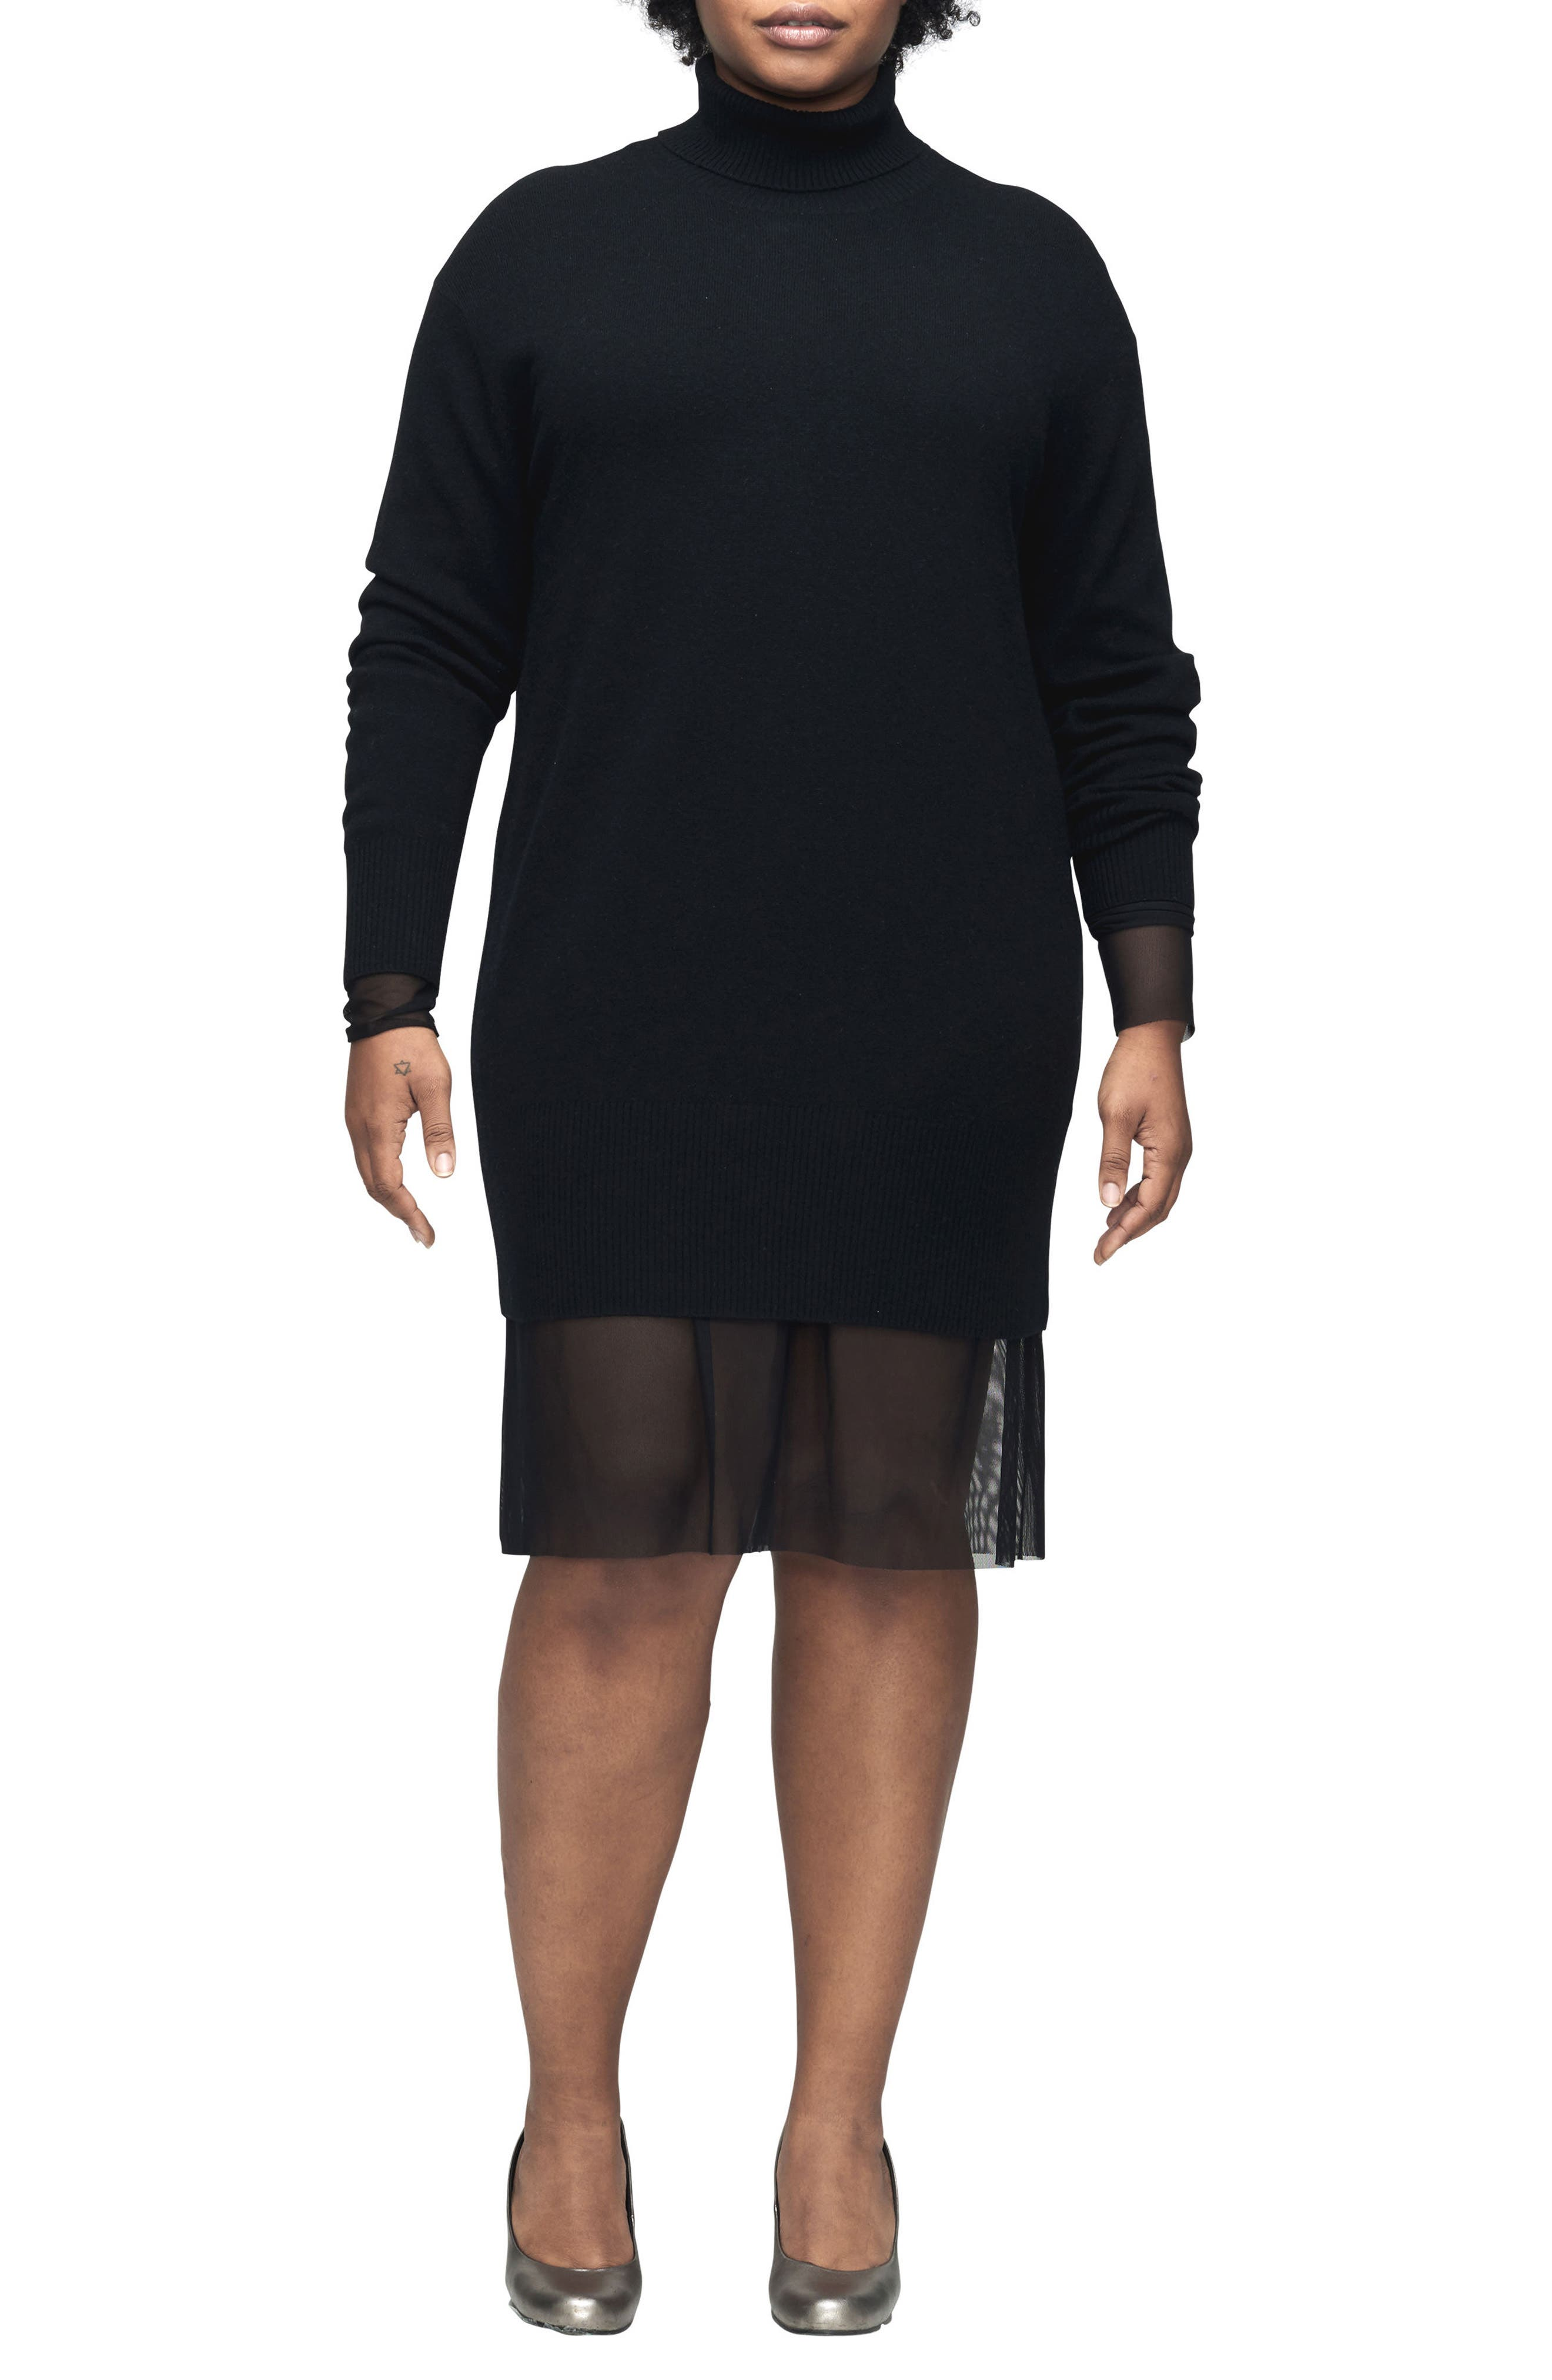 Wheaton Turtleneck Sweater,                             Main thumbnail 1, color,                             001